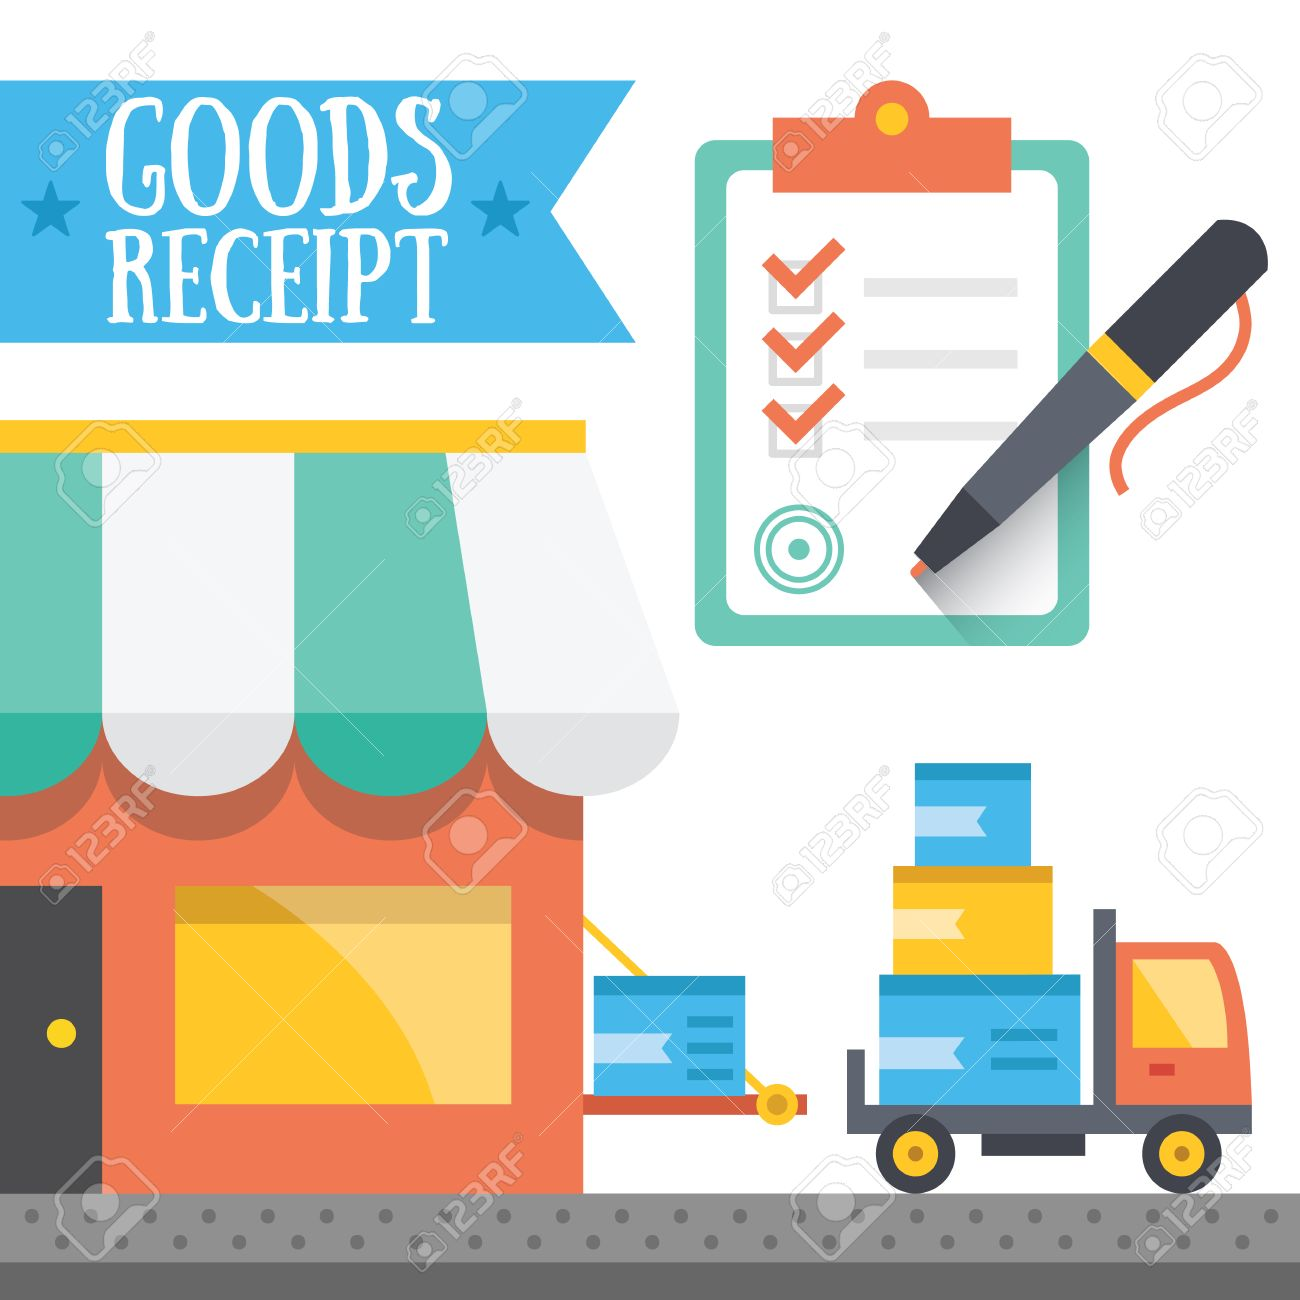 Goods receipt concept  Vector illustration